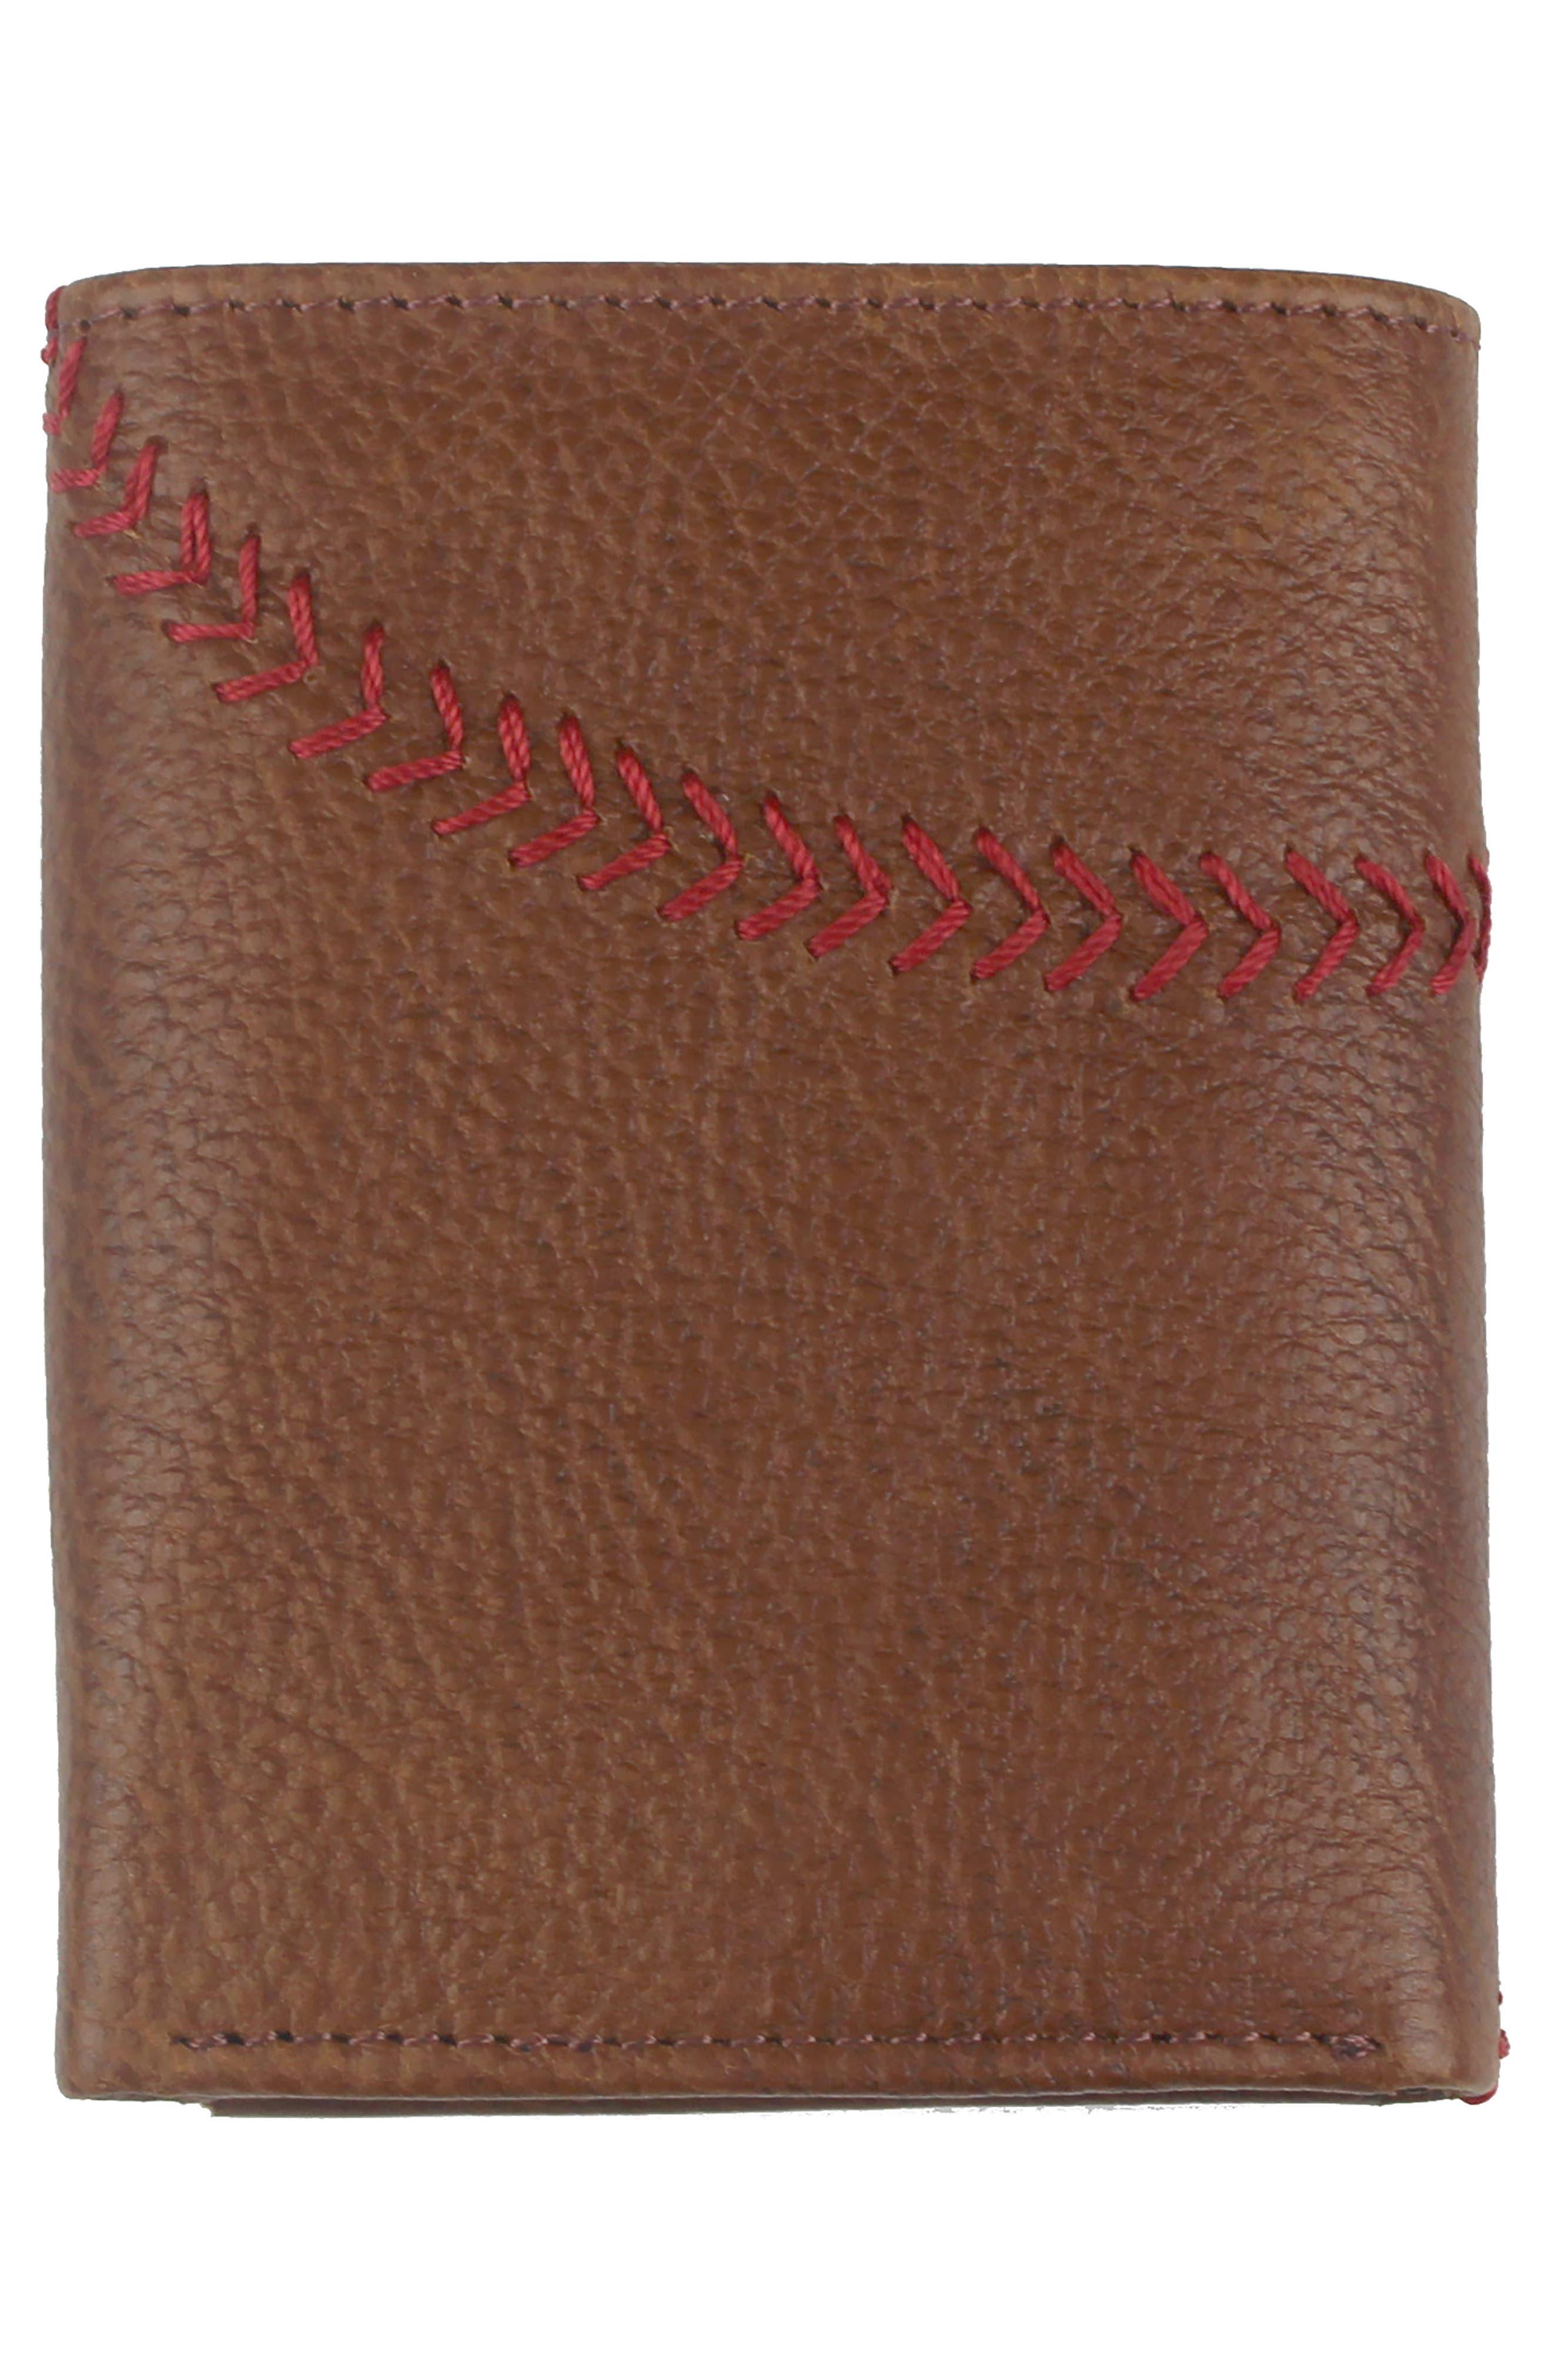 Home Run Trifold,                             Alternate thumbnail 2, color,                             202